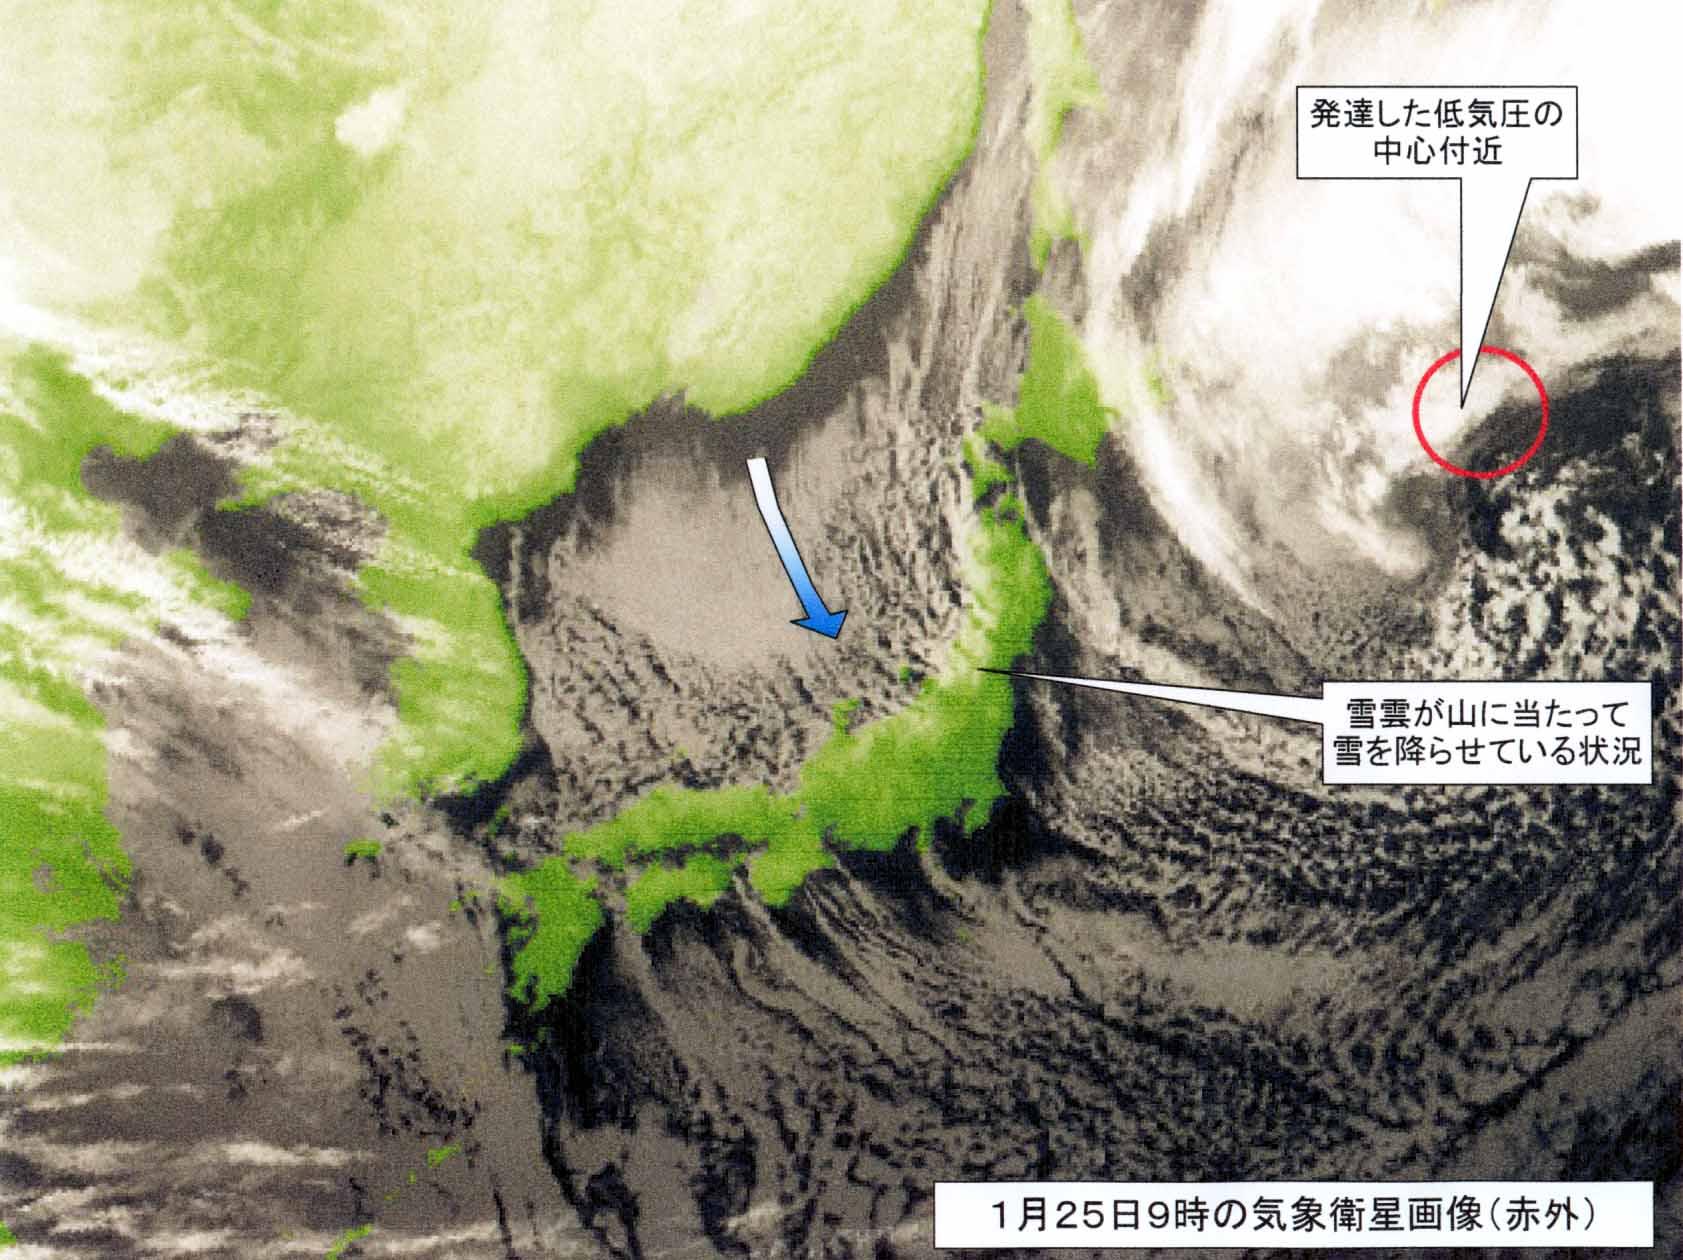 2008年1月25日9時の気象画像説明